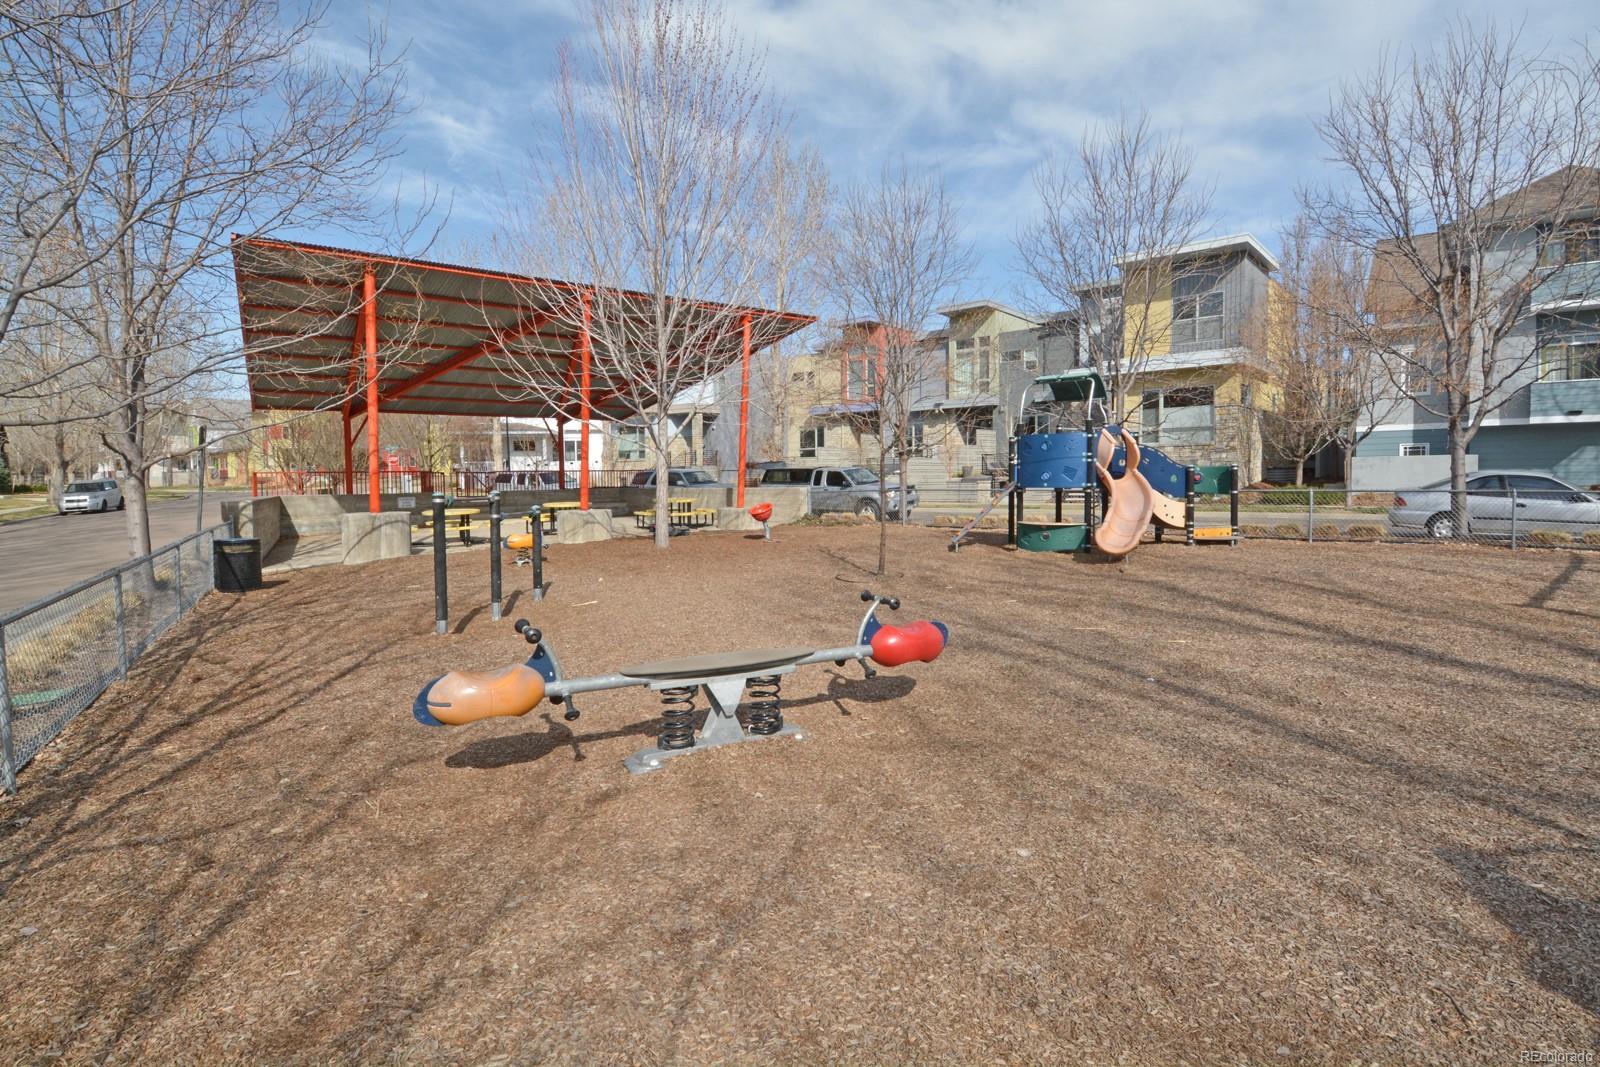 Nearby Prospect Playground